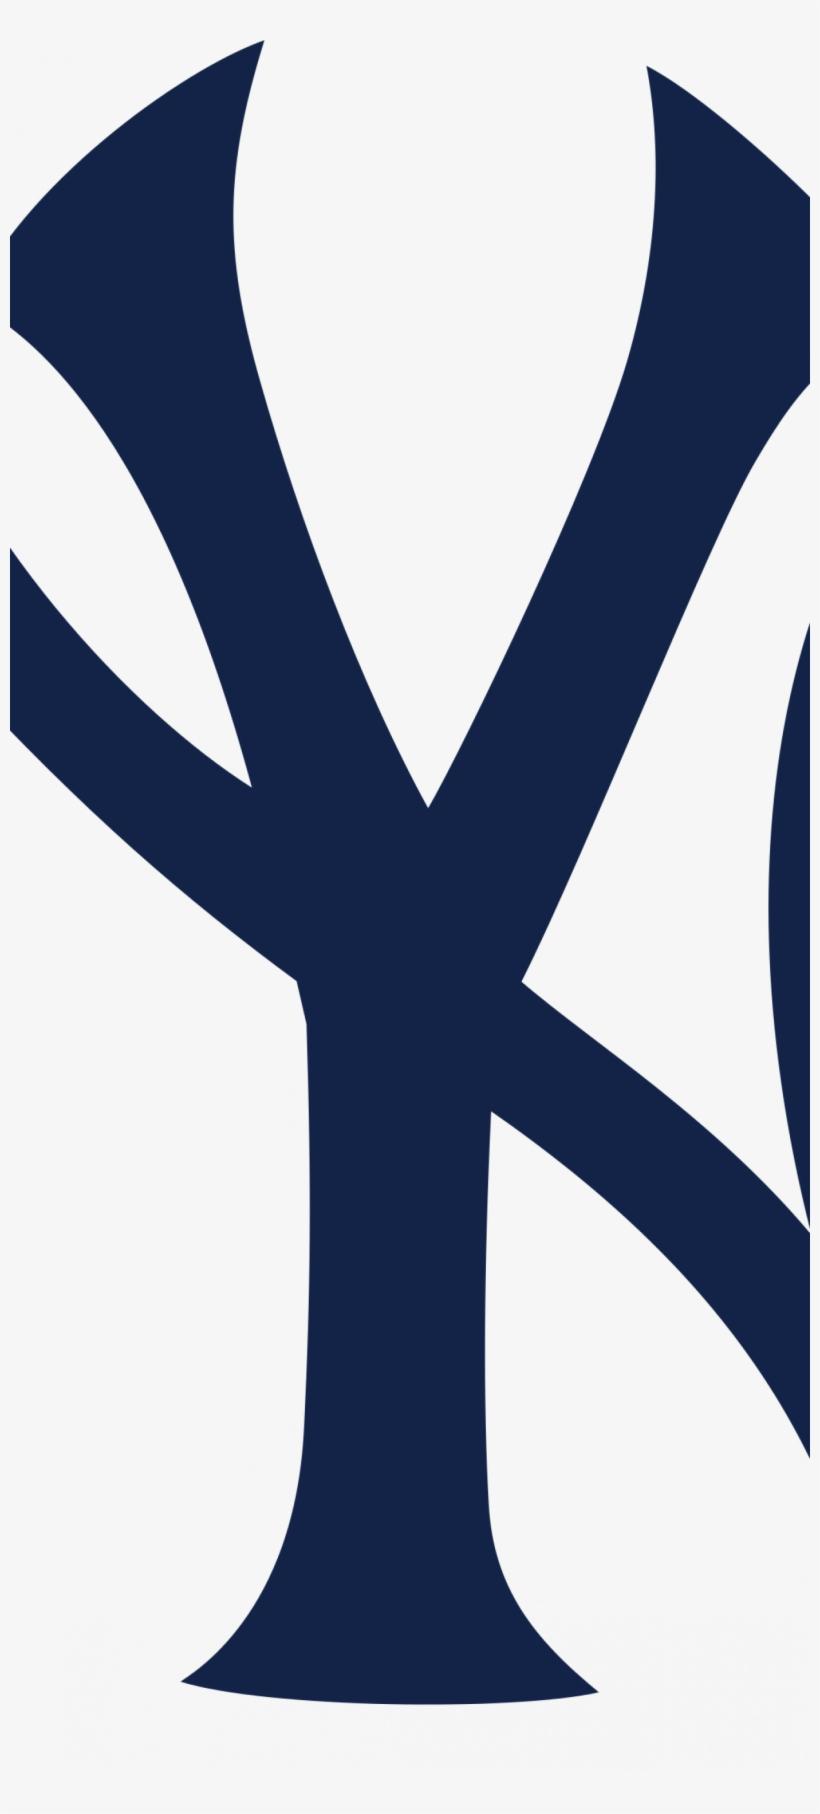 Iphone Xs Max Yankees Wallpaper Iphone Xs Free